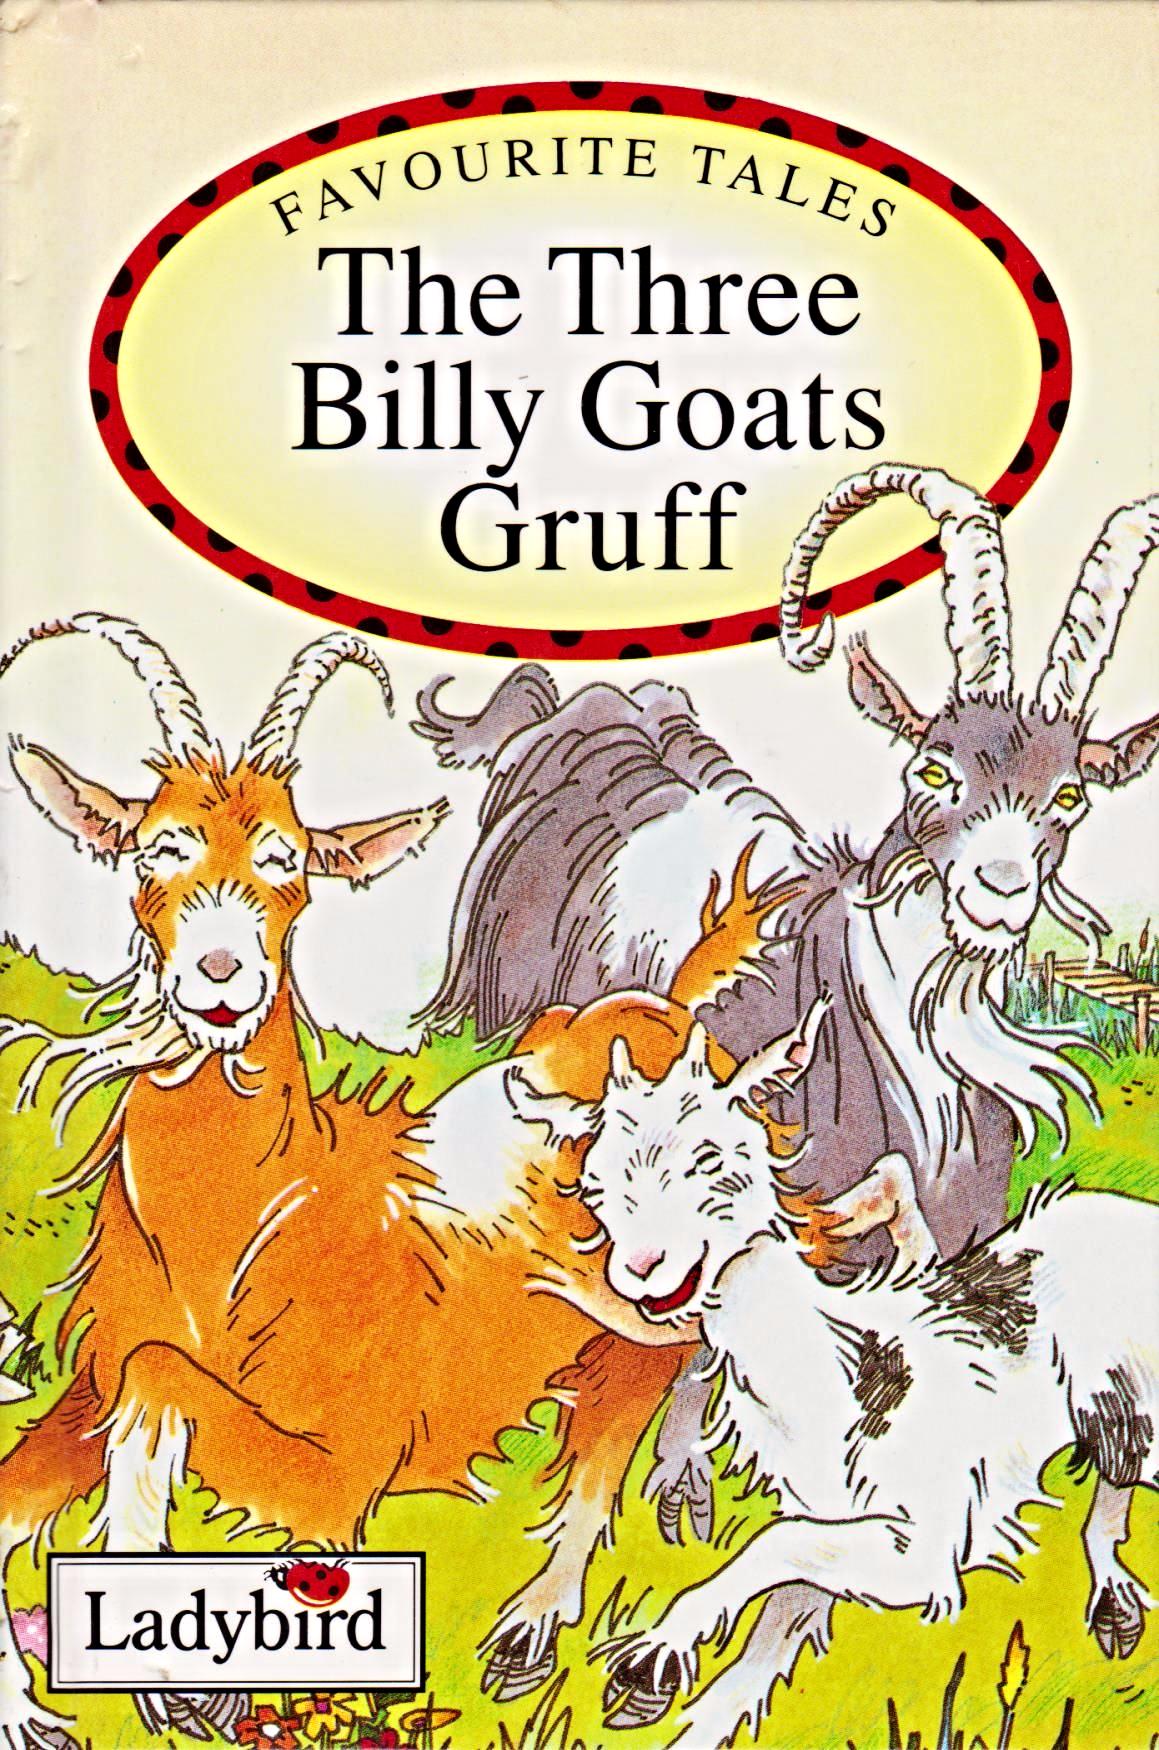 Billy Goat Gruff PNG - 150330